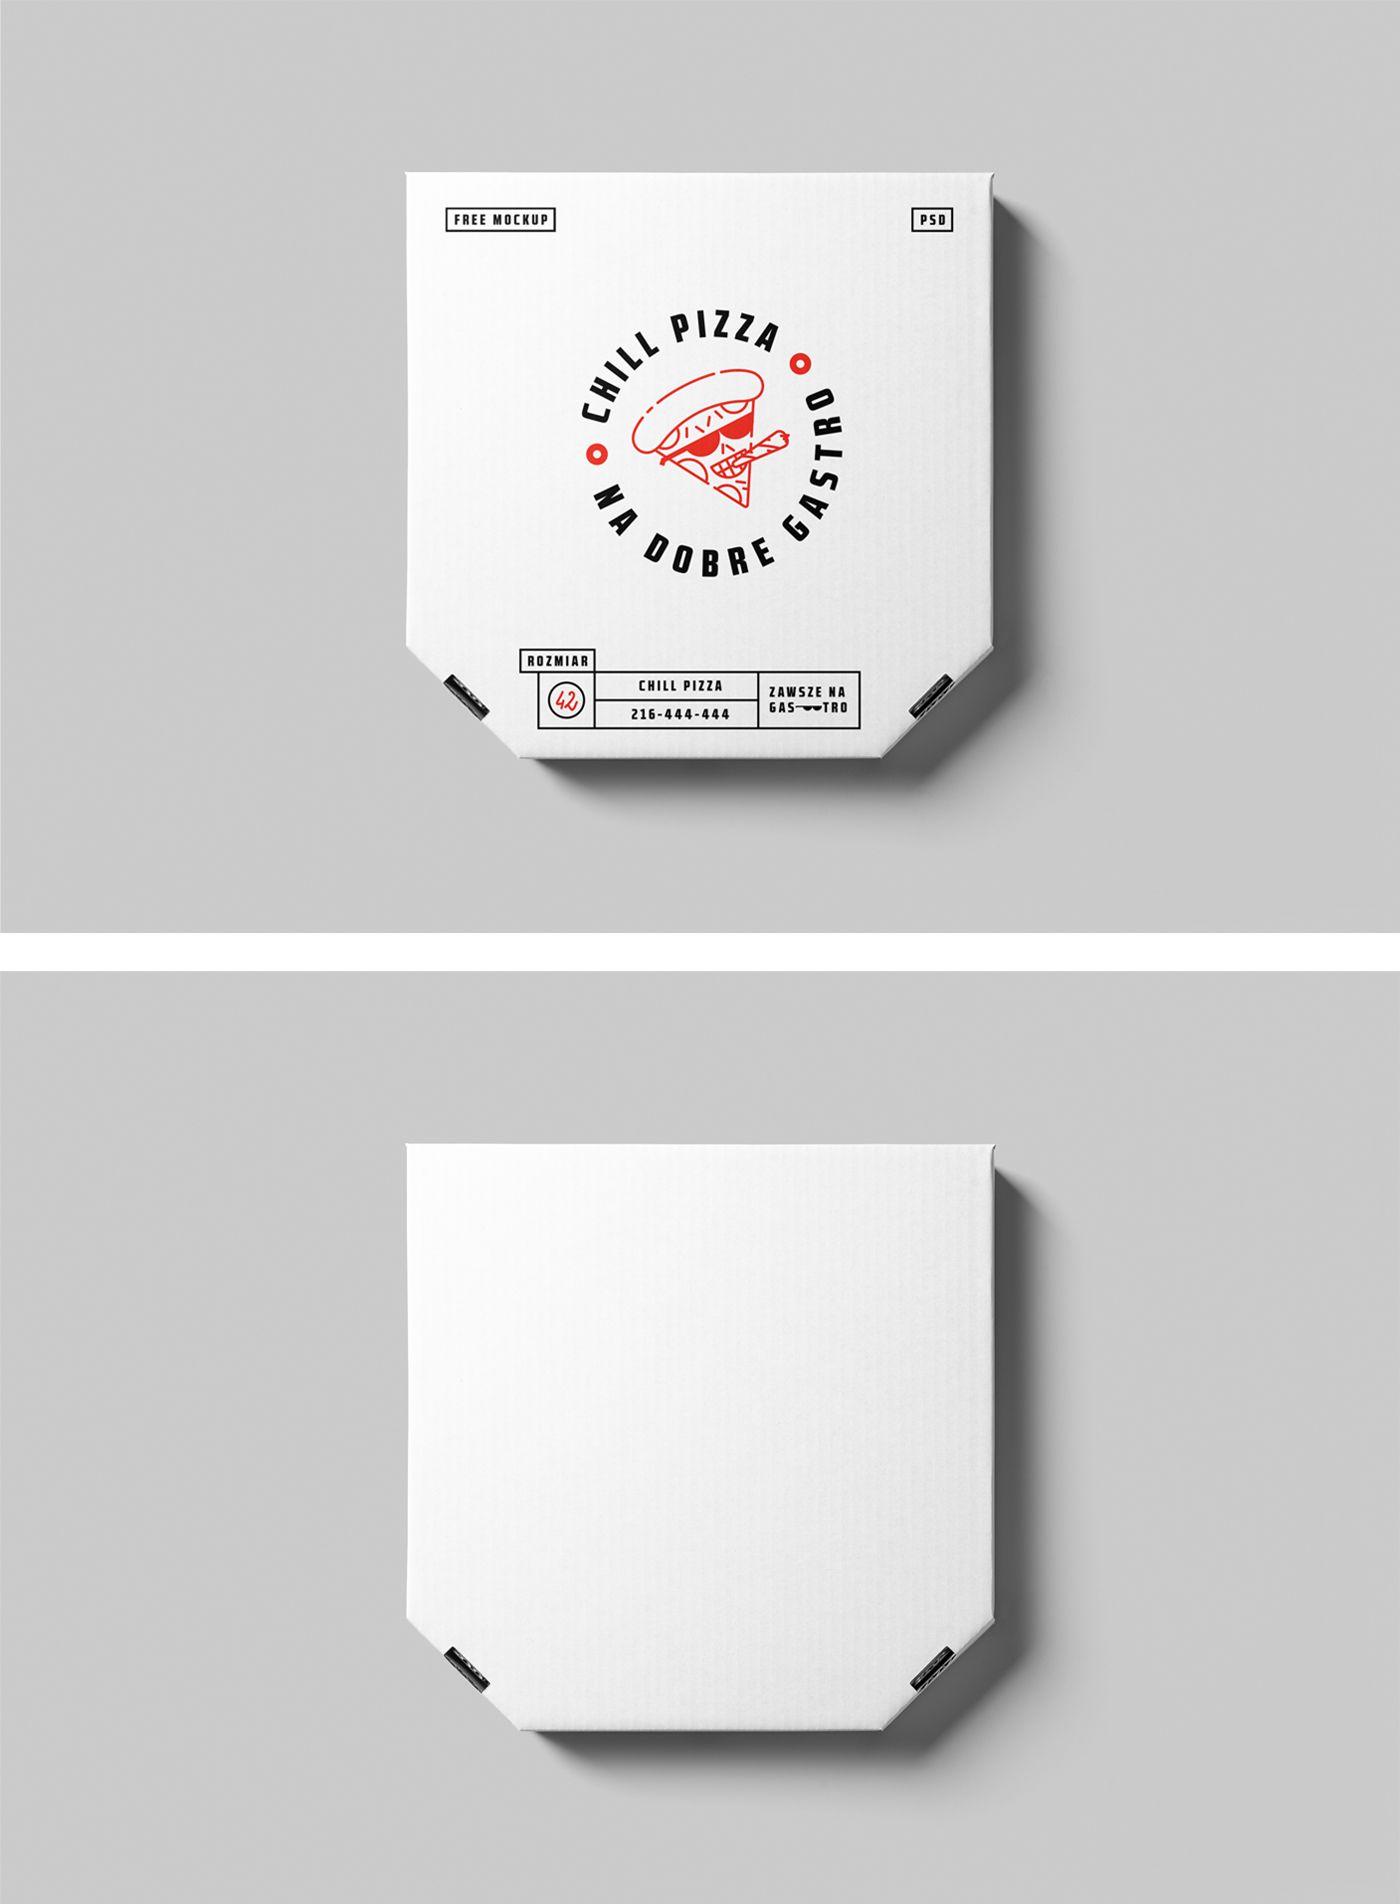 Download Pizza Box Mockup Mr Mockup Graphic Design Freebies Pizza Box Design Pizza Boxes Graphic Design Freebies